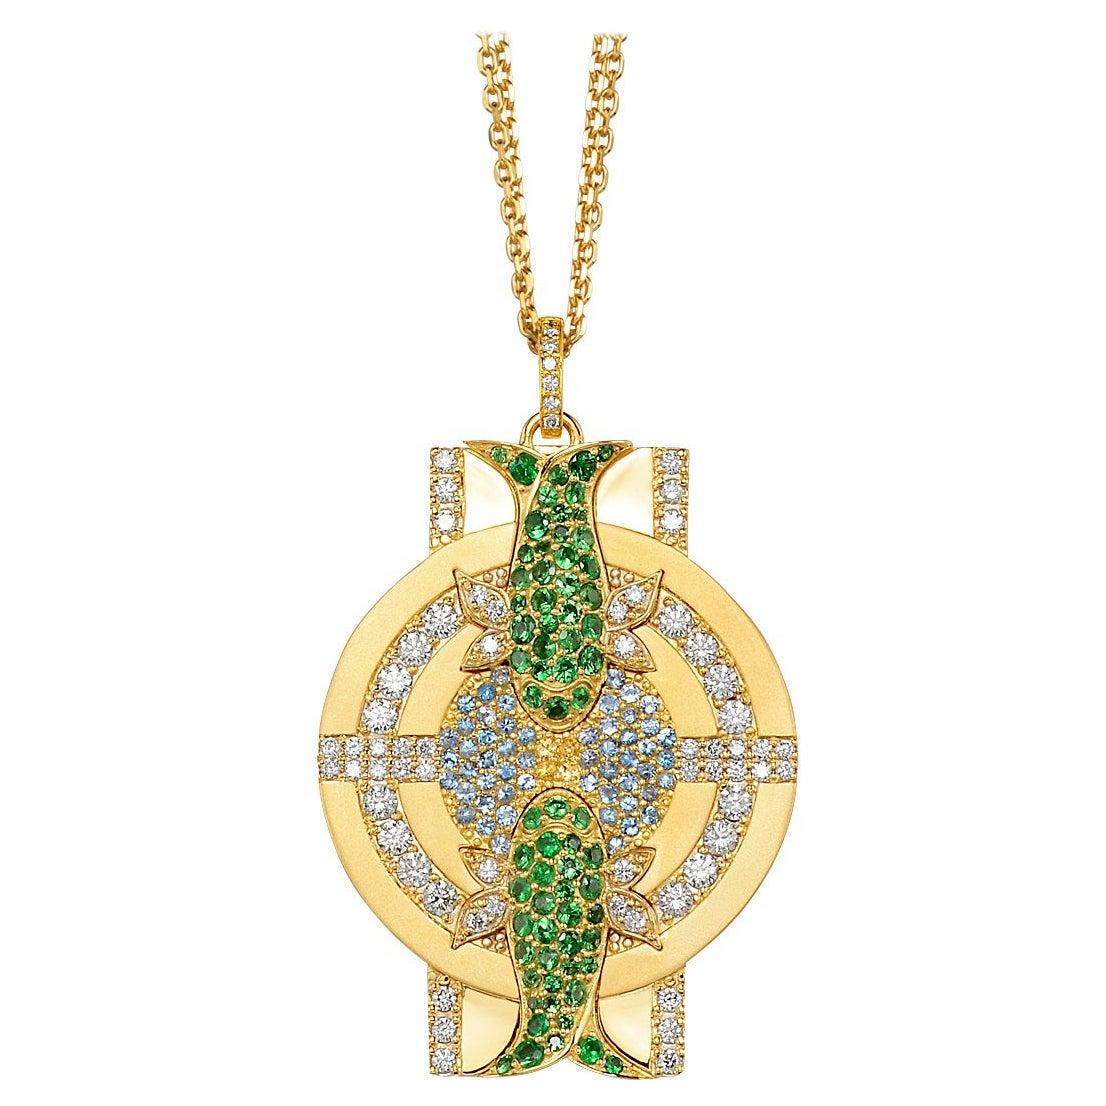 Jazychic Zodiac Pendant 18k Gold, Diamonds, Sapphires, Aquamarines, Tsavorites